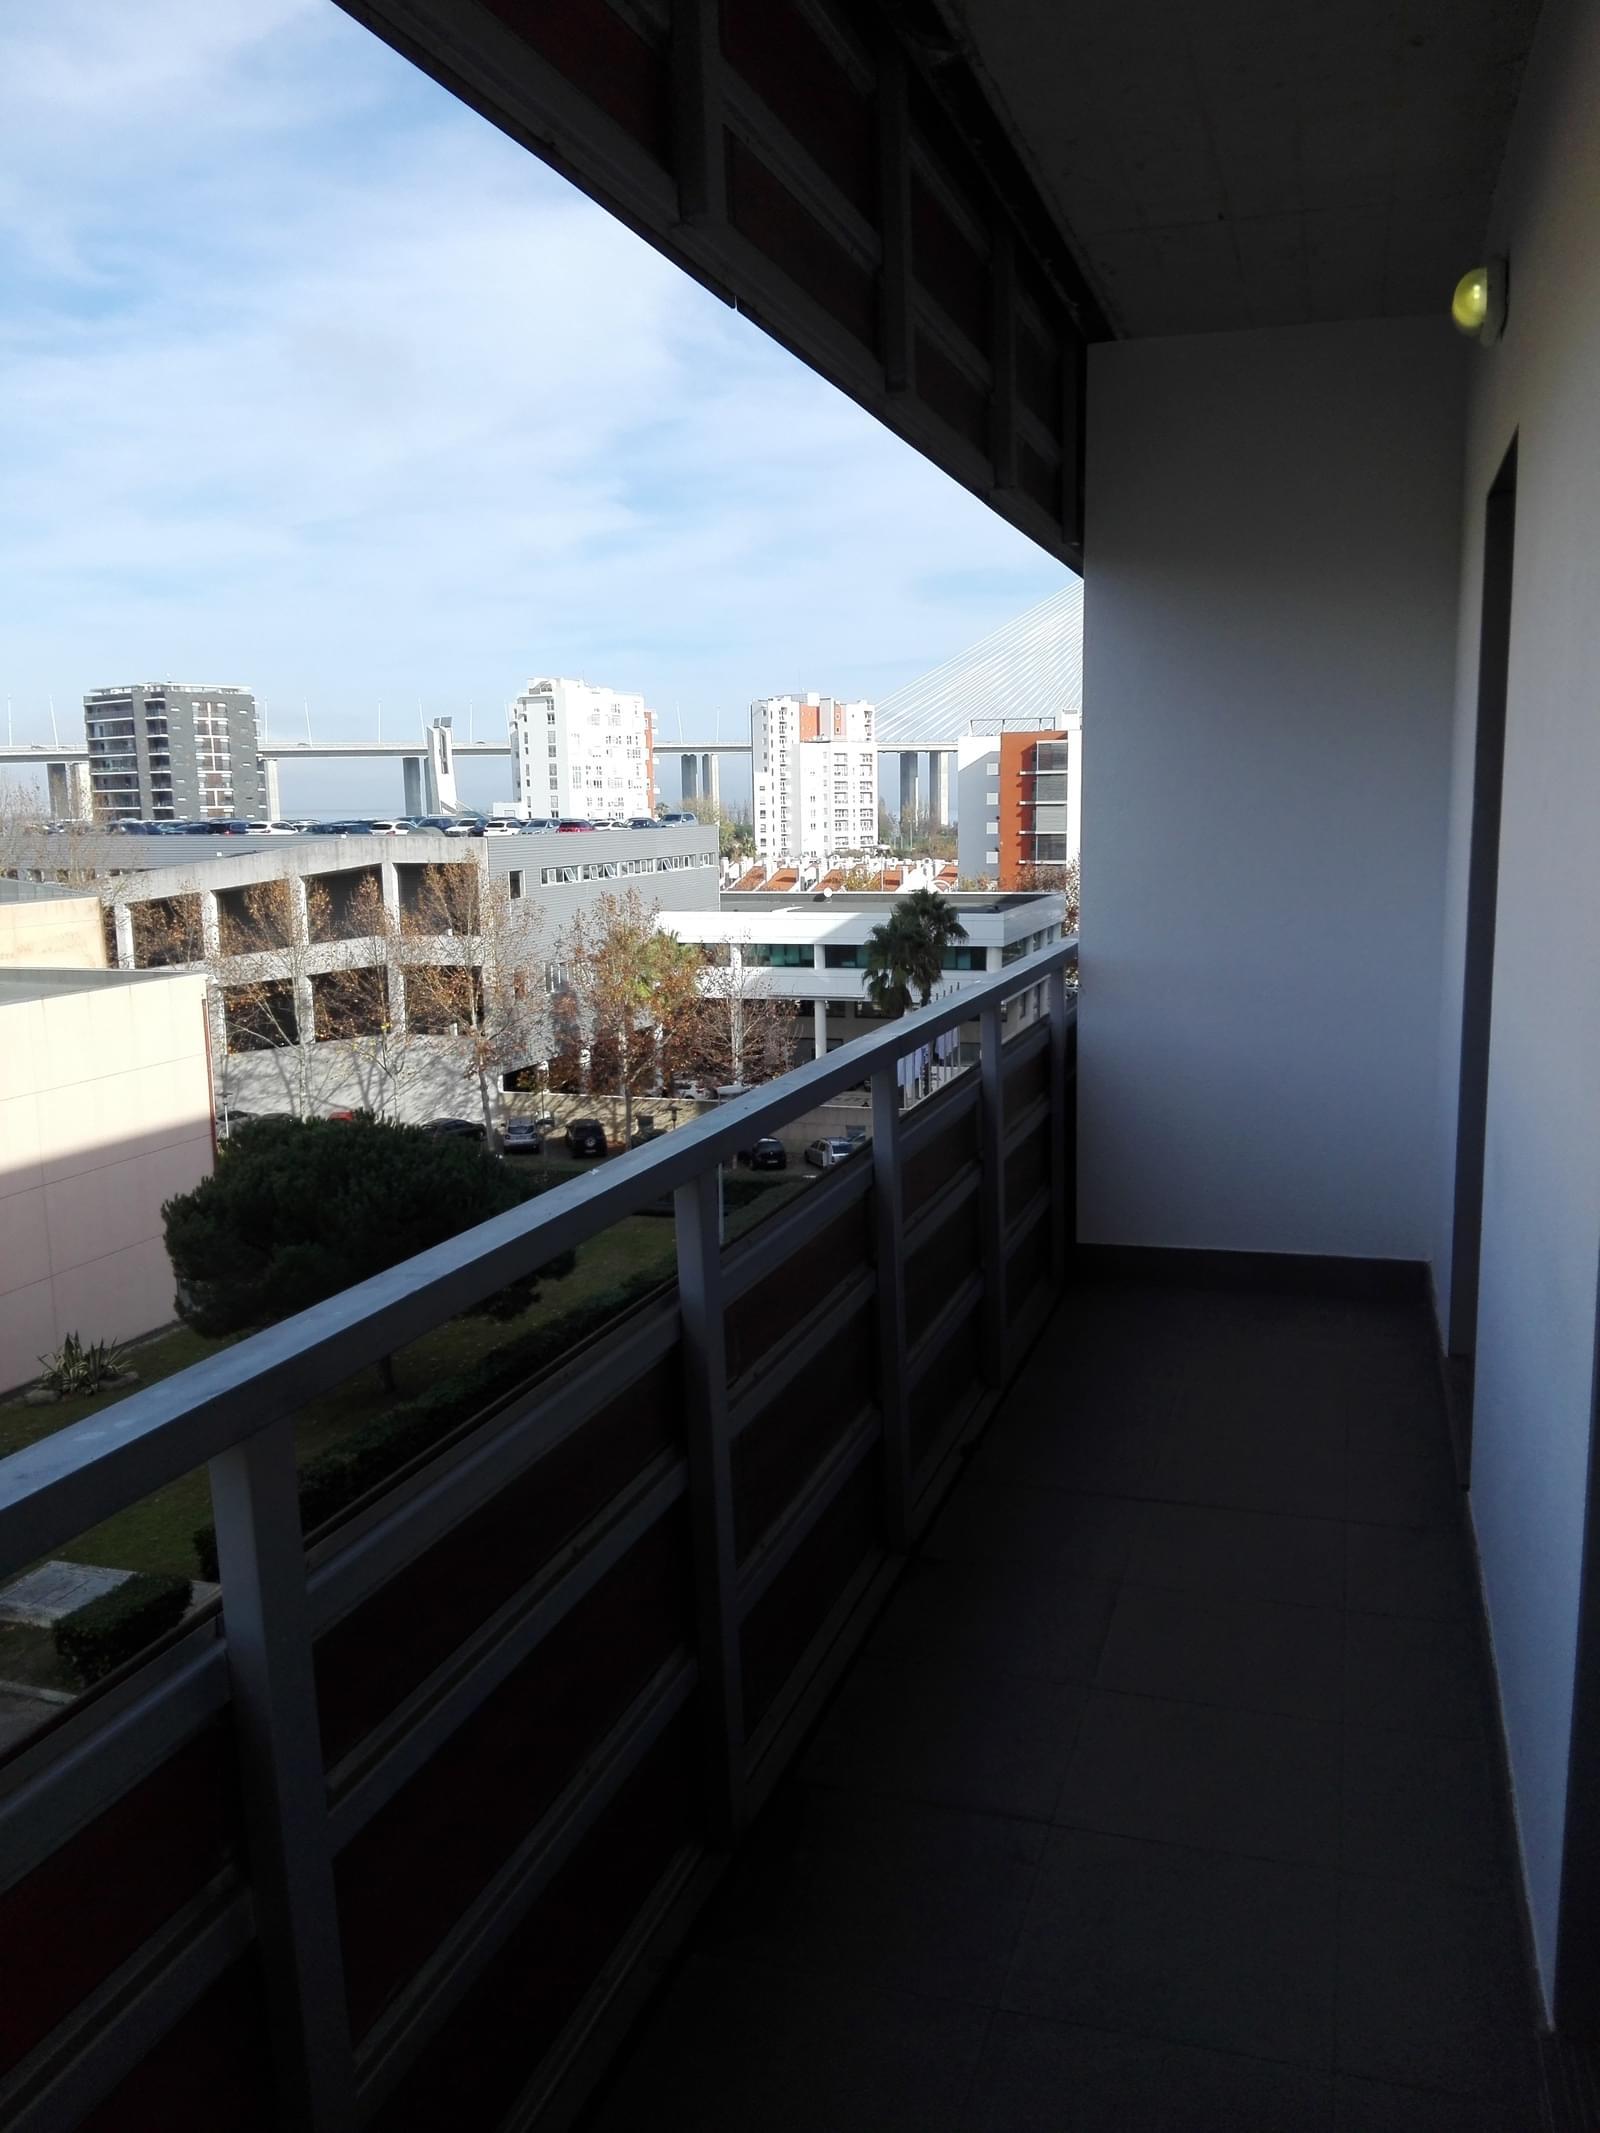 pf18814-apartamento-t2-lisboa-eb26d621-7117-46bf-b283-f67688e9712d